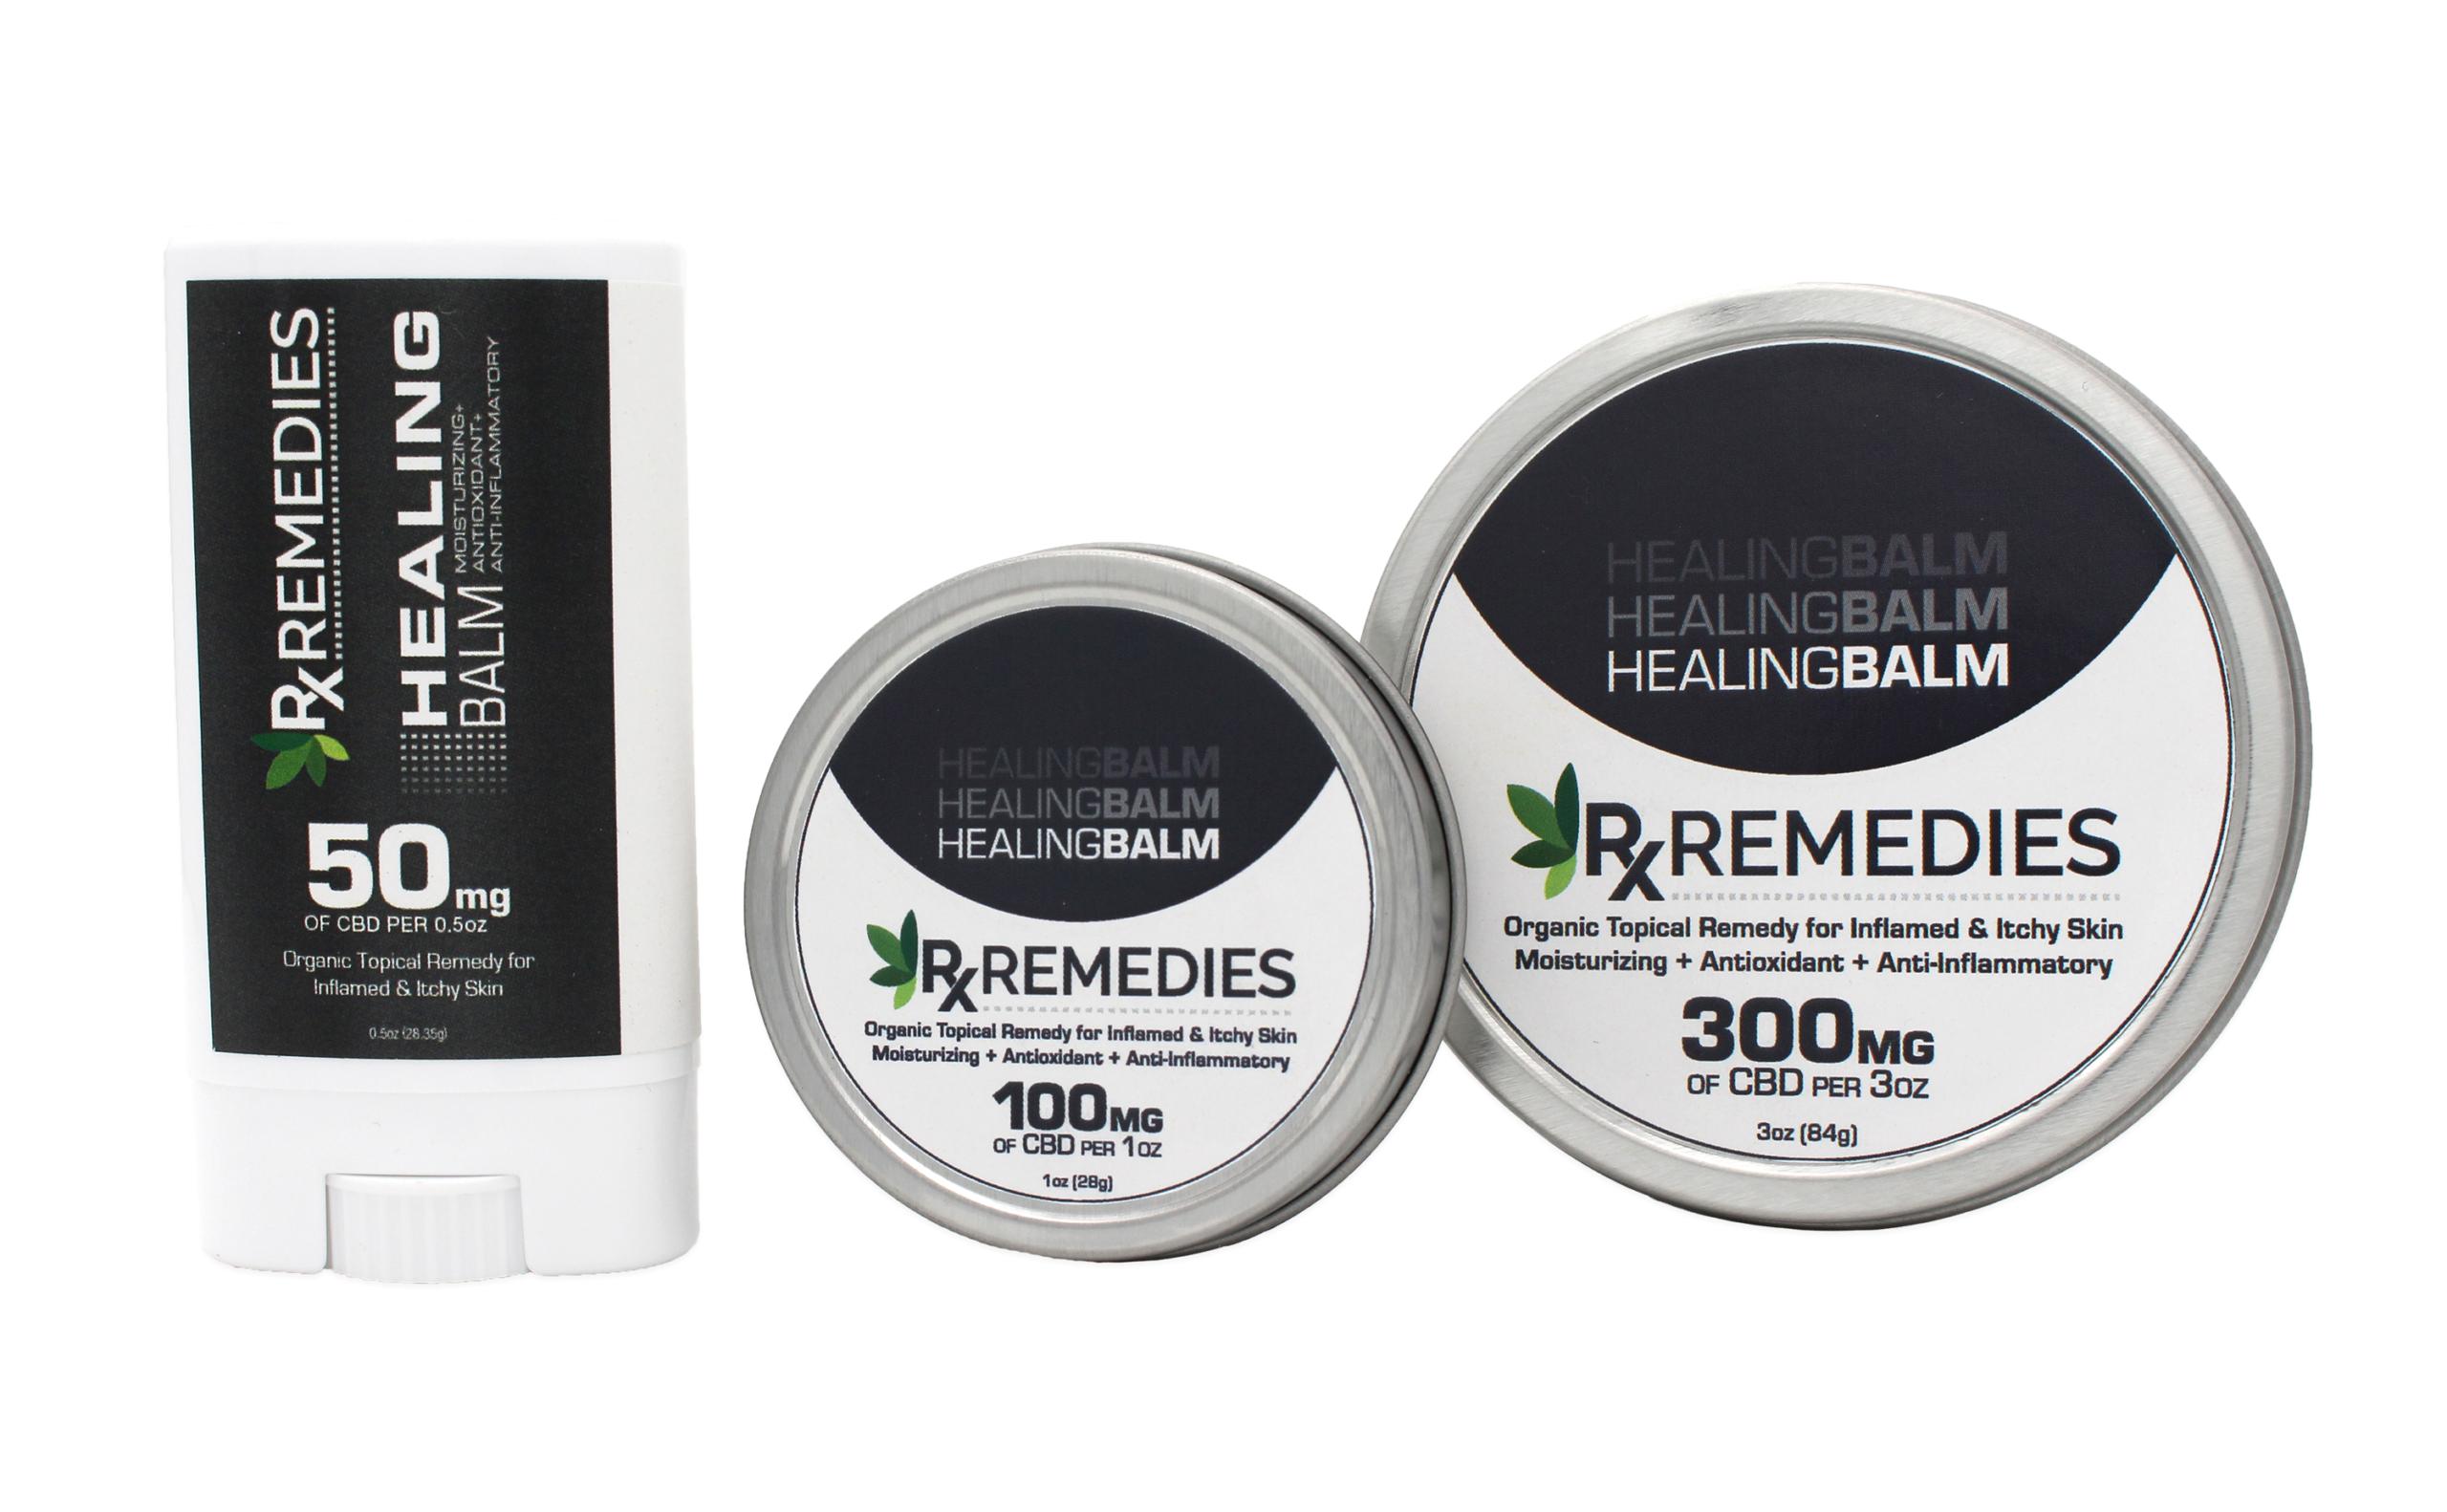 Rx Remedies, Healing Balm Group, 100mg/oz